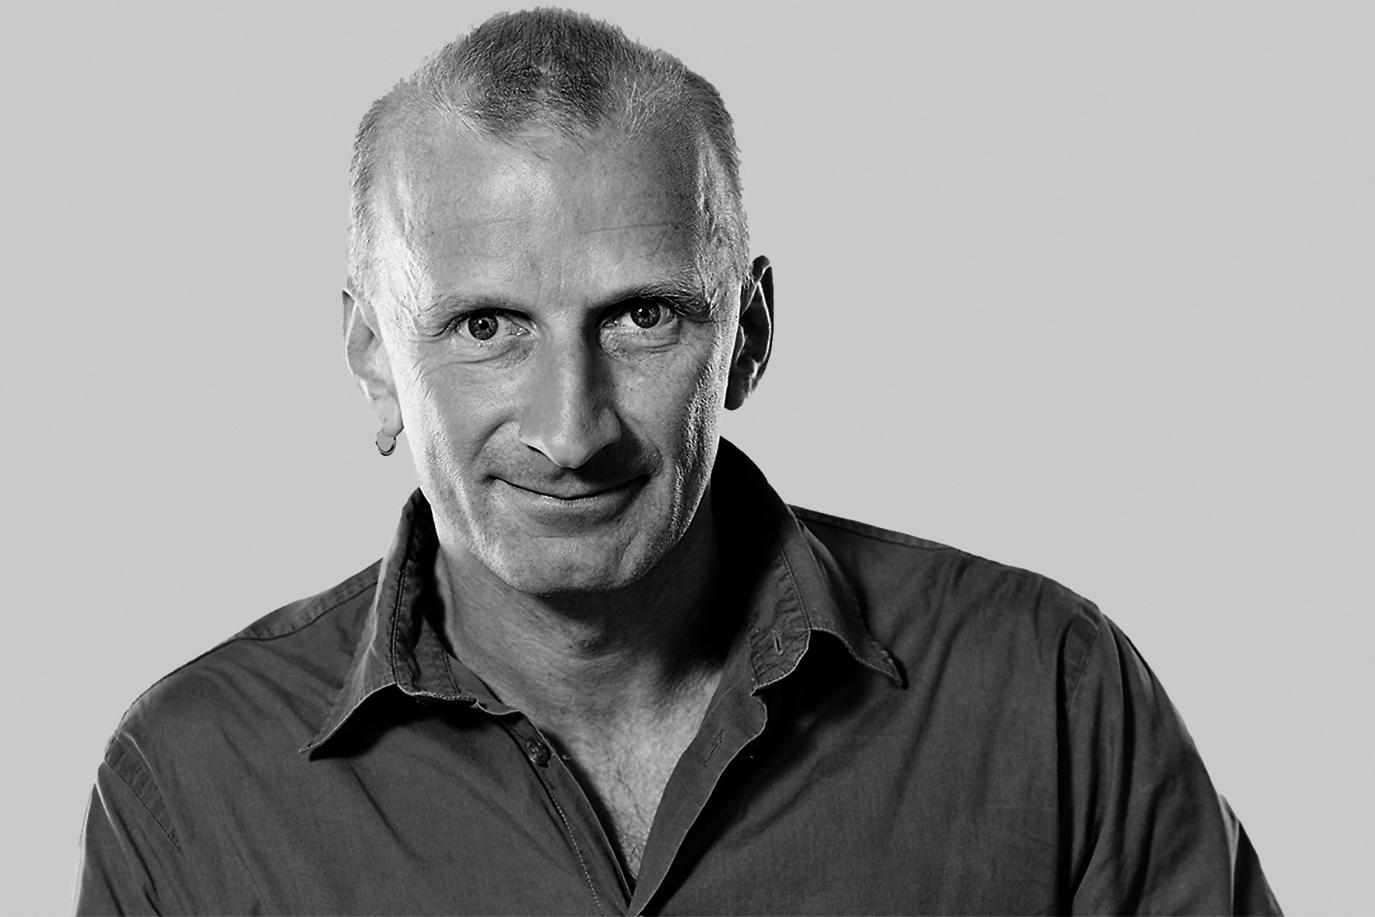 Frank Urbaniok